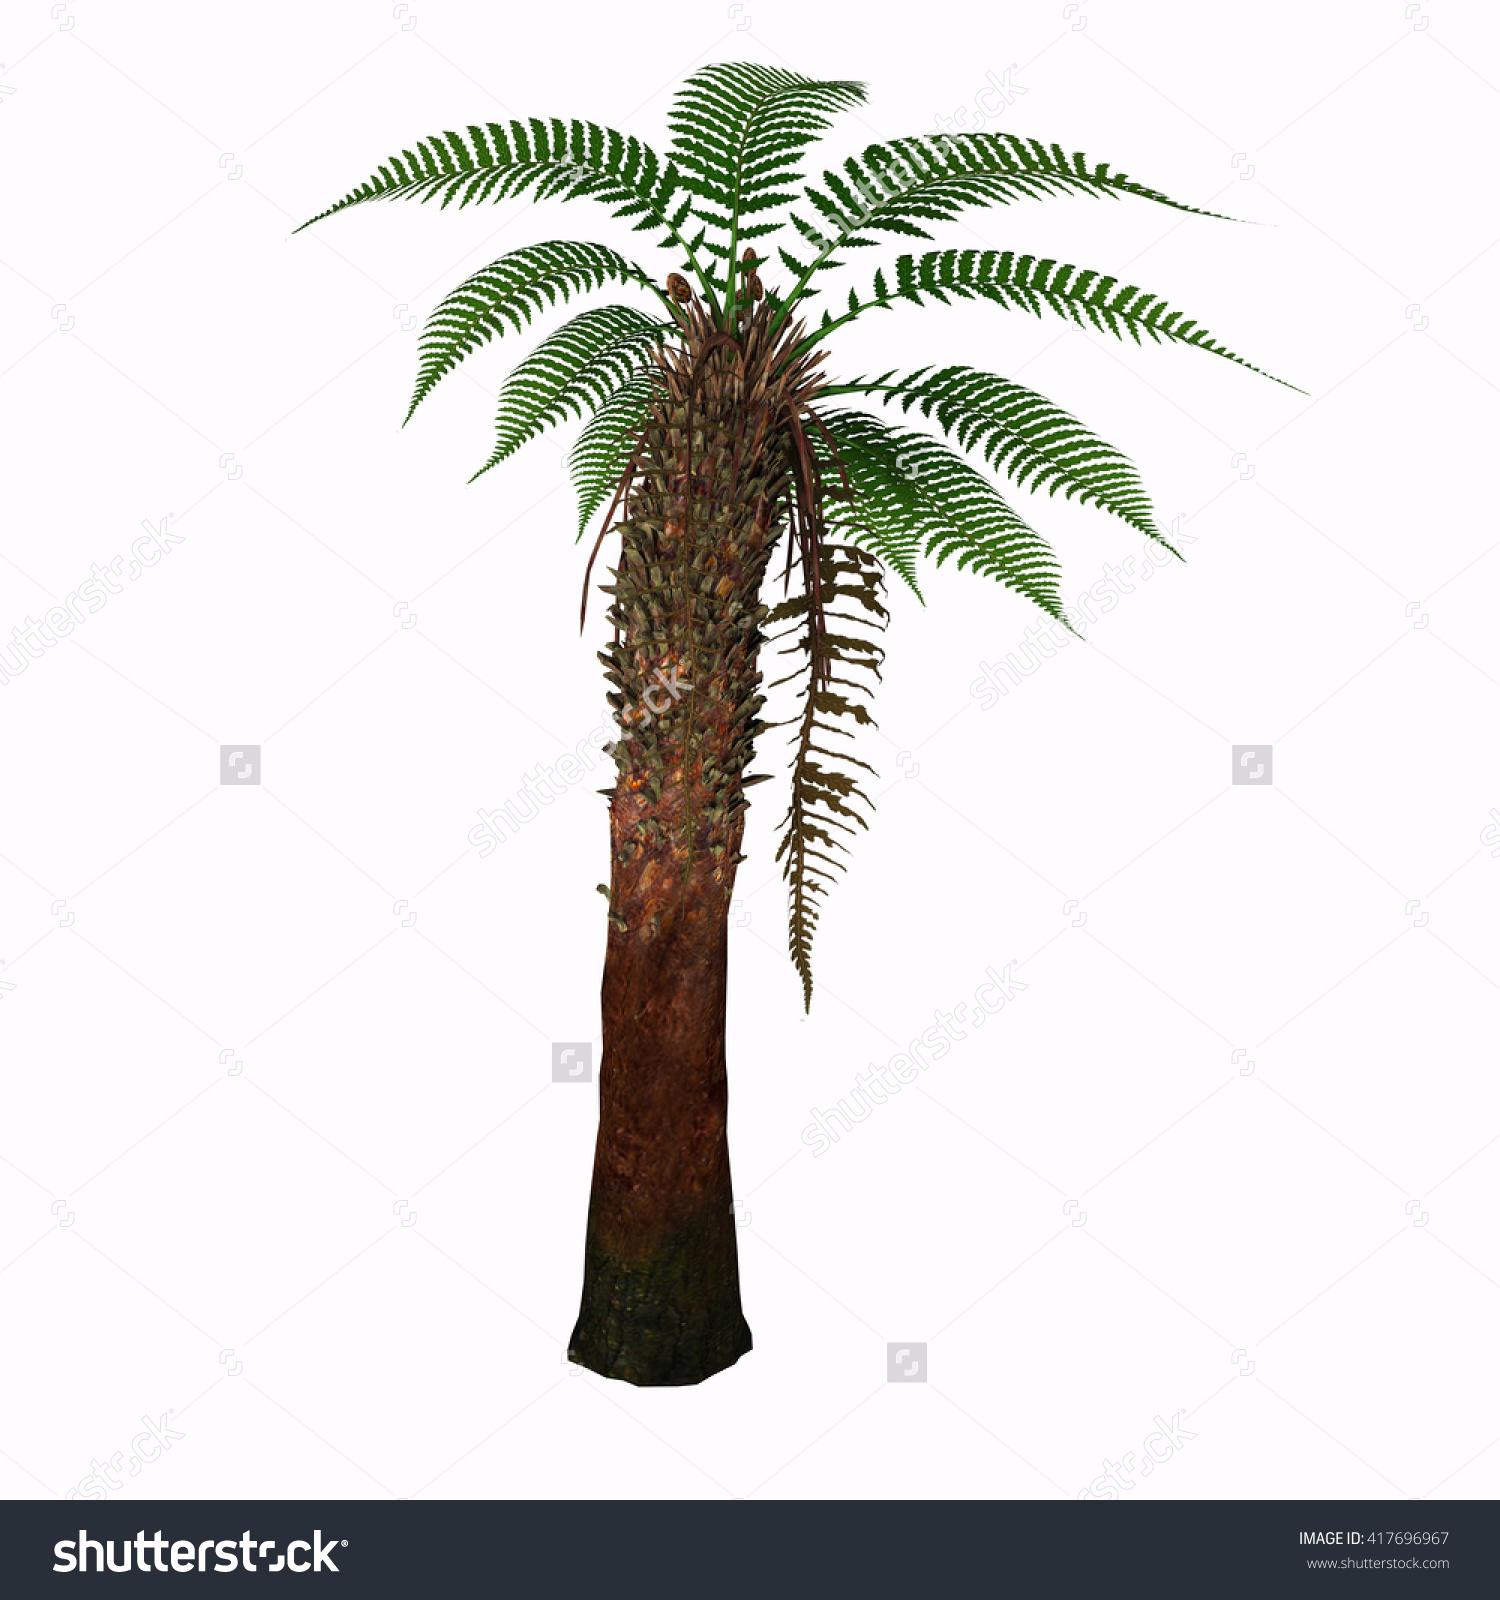 Dicksonia Tree 3d Illustration Dicksonia Antarctica Stock.